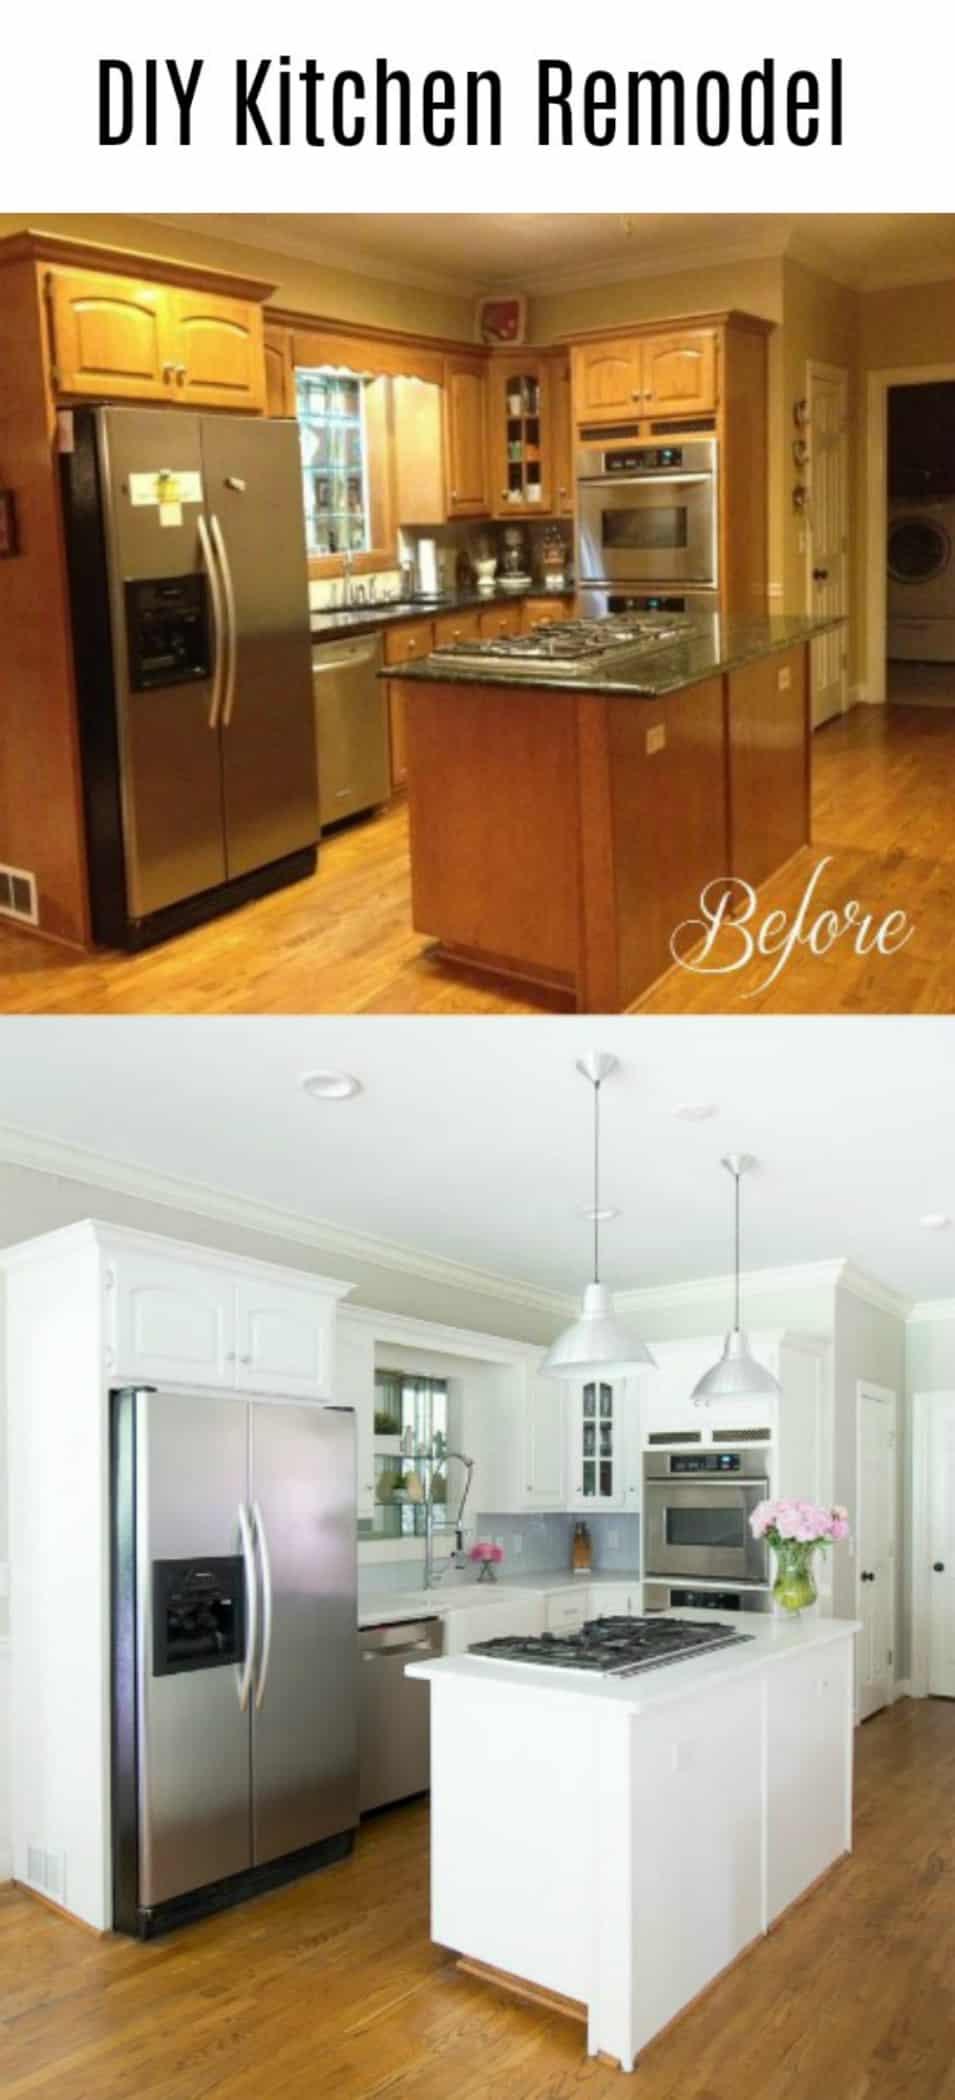 DIY Kitchen Remodel Reveal | Savvy Apron